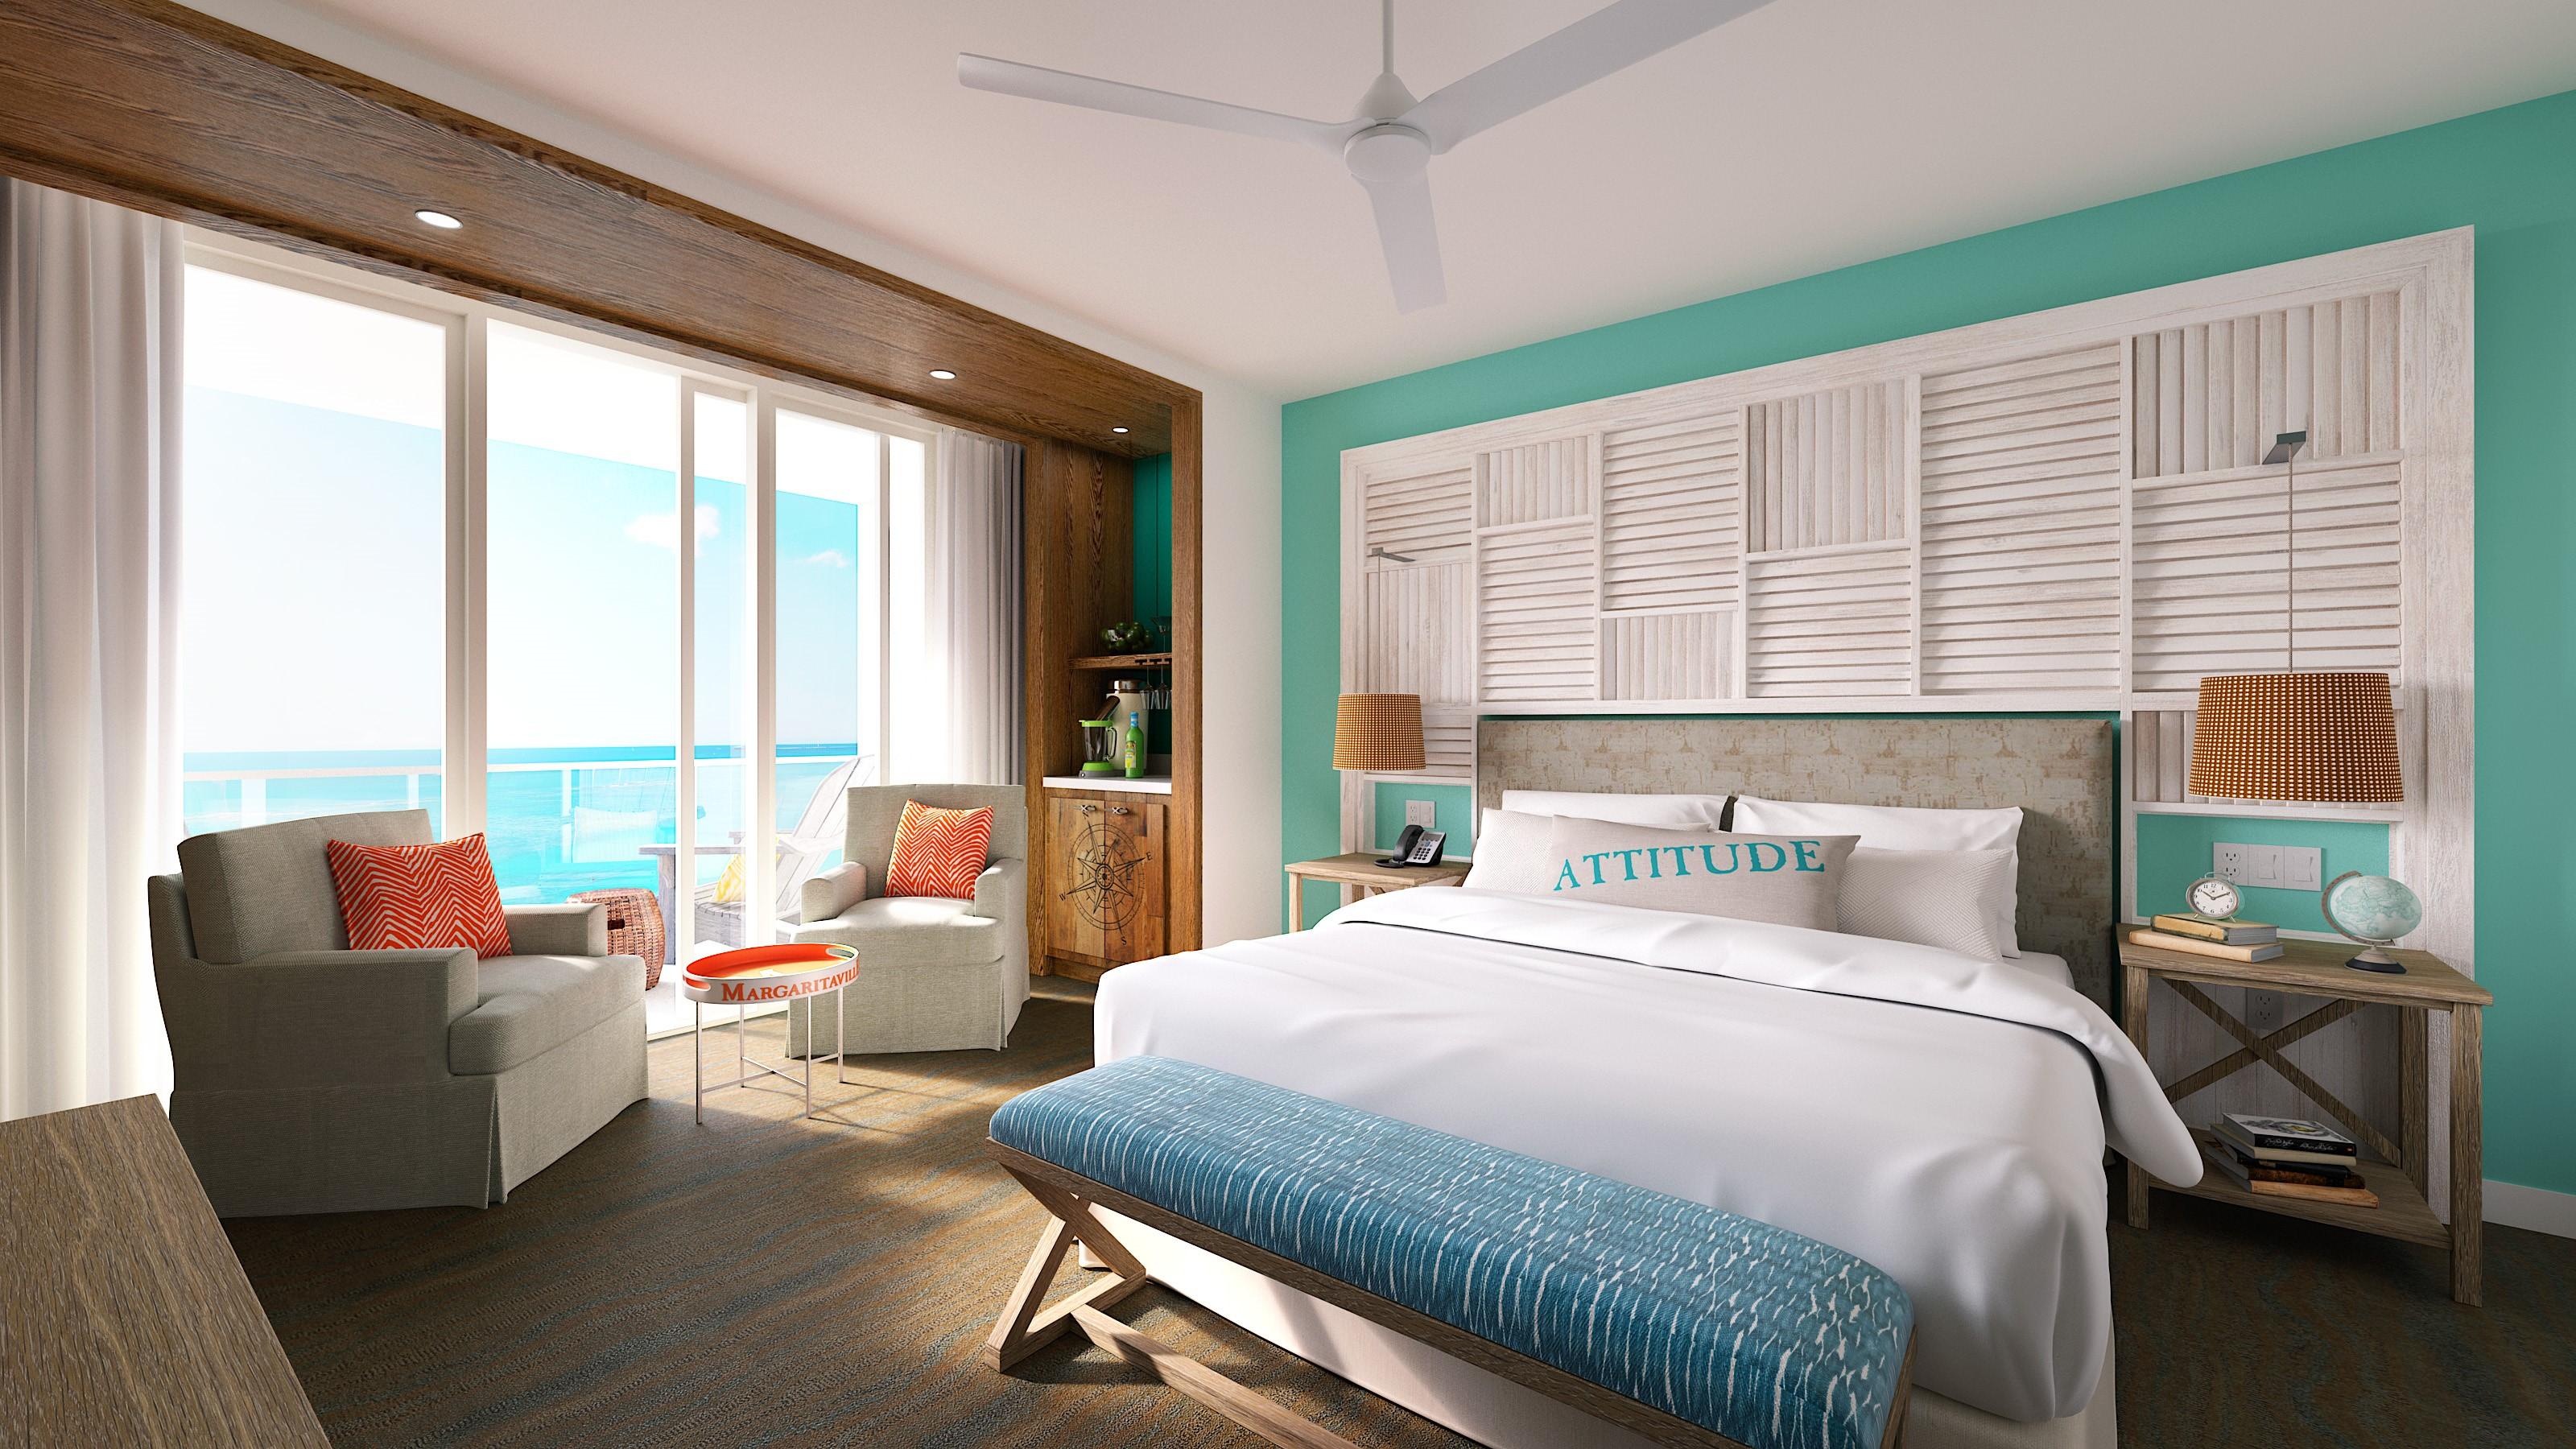 Margaritaville-Hollywood-Beach-Guestroom-Venicemagftl